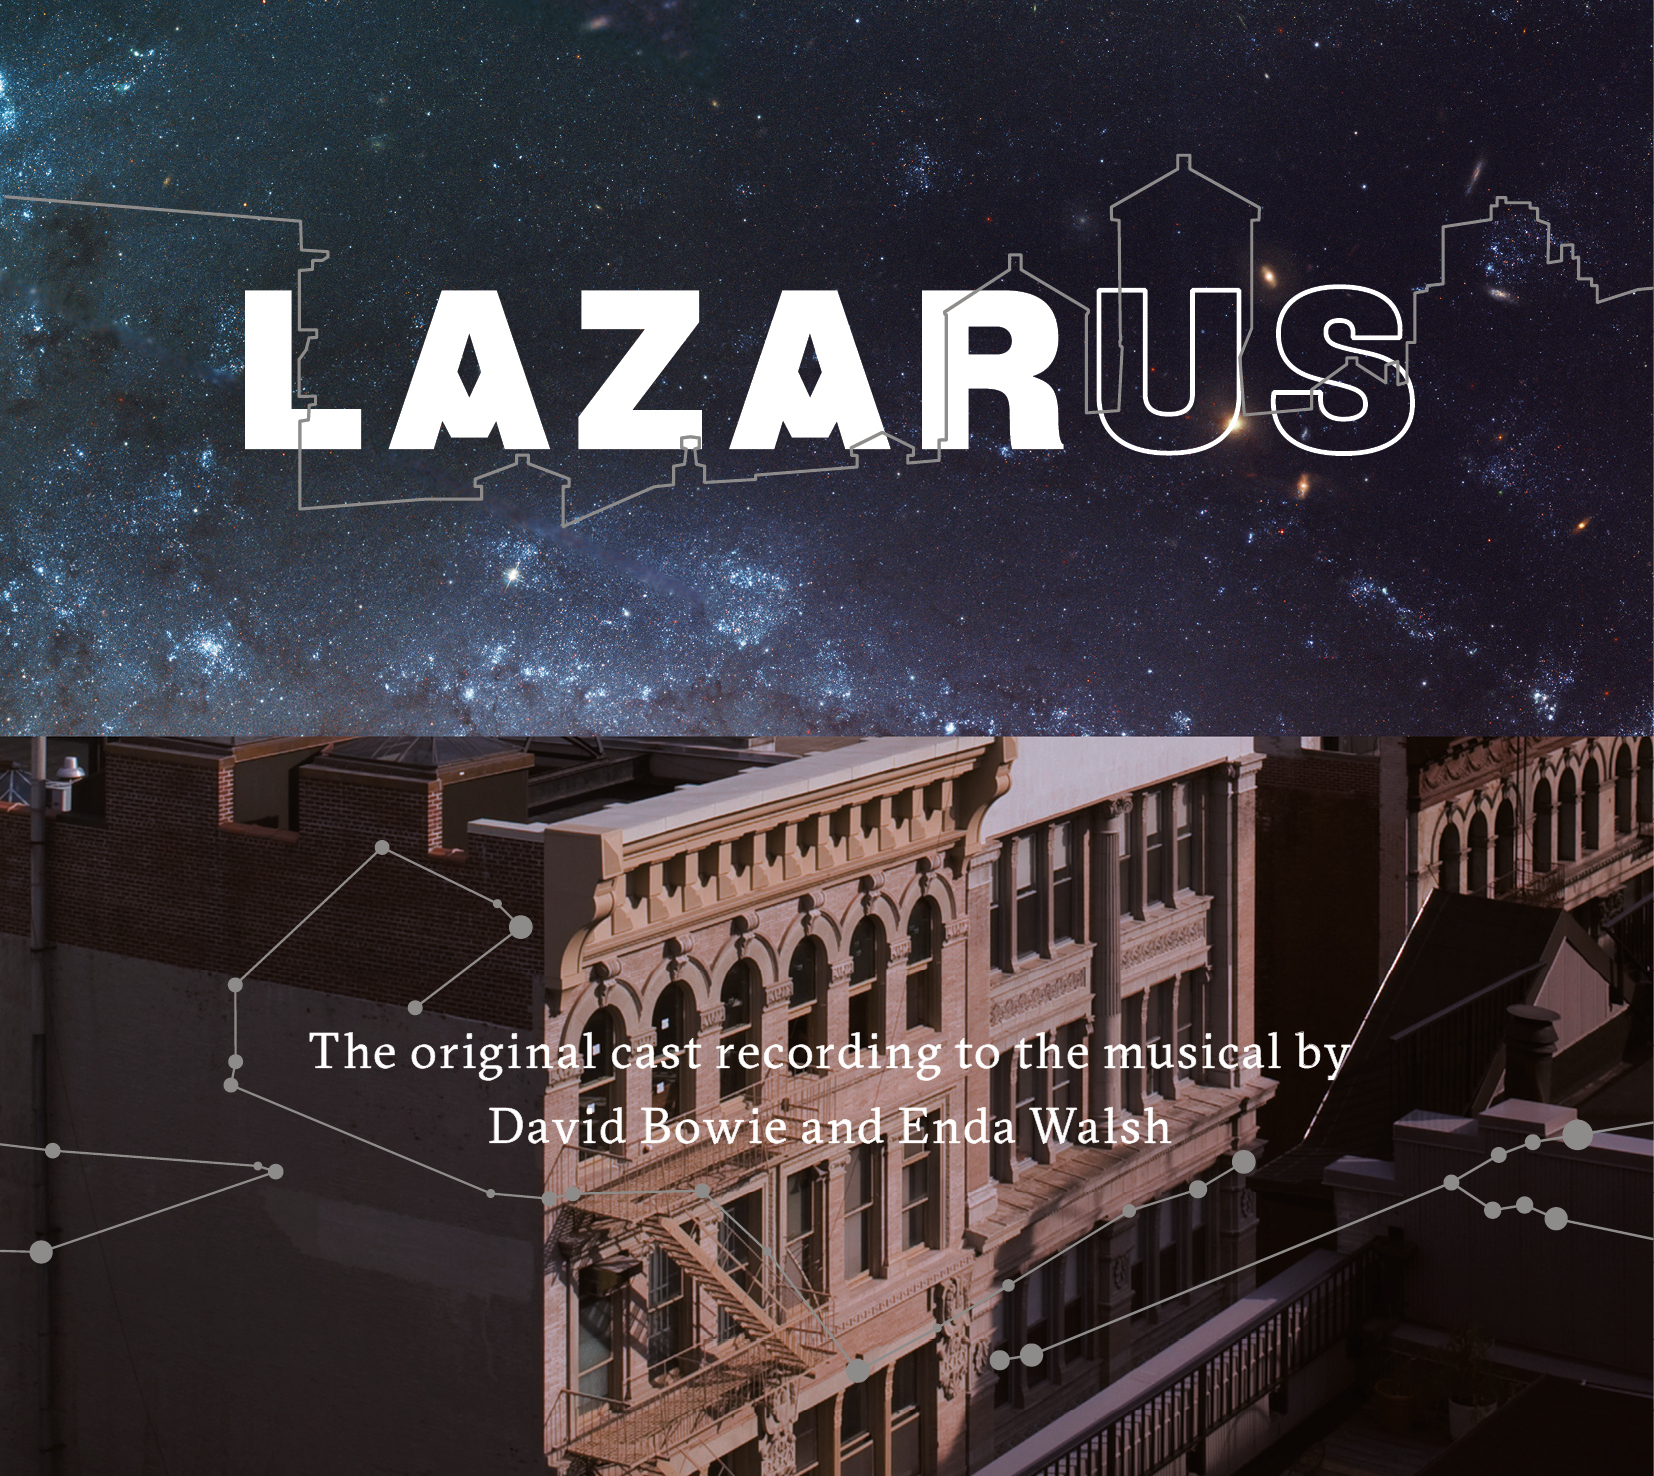 DAVID BOWIE - LAZARUS (ORIGINAL CAST RECORDING) [2CD DIGIPACK]